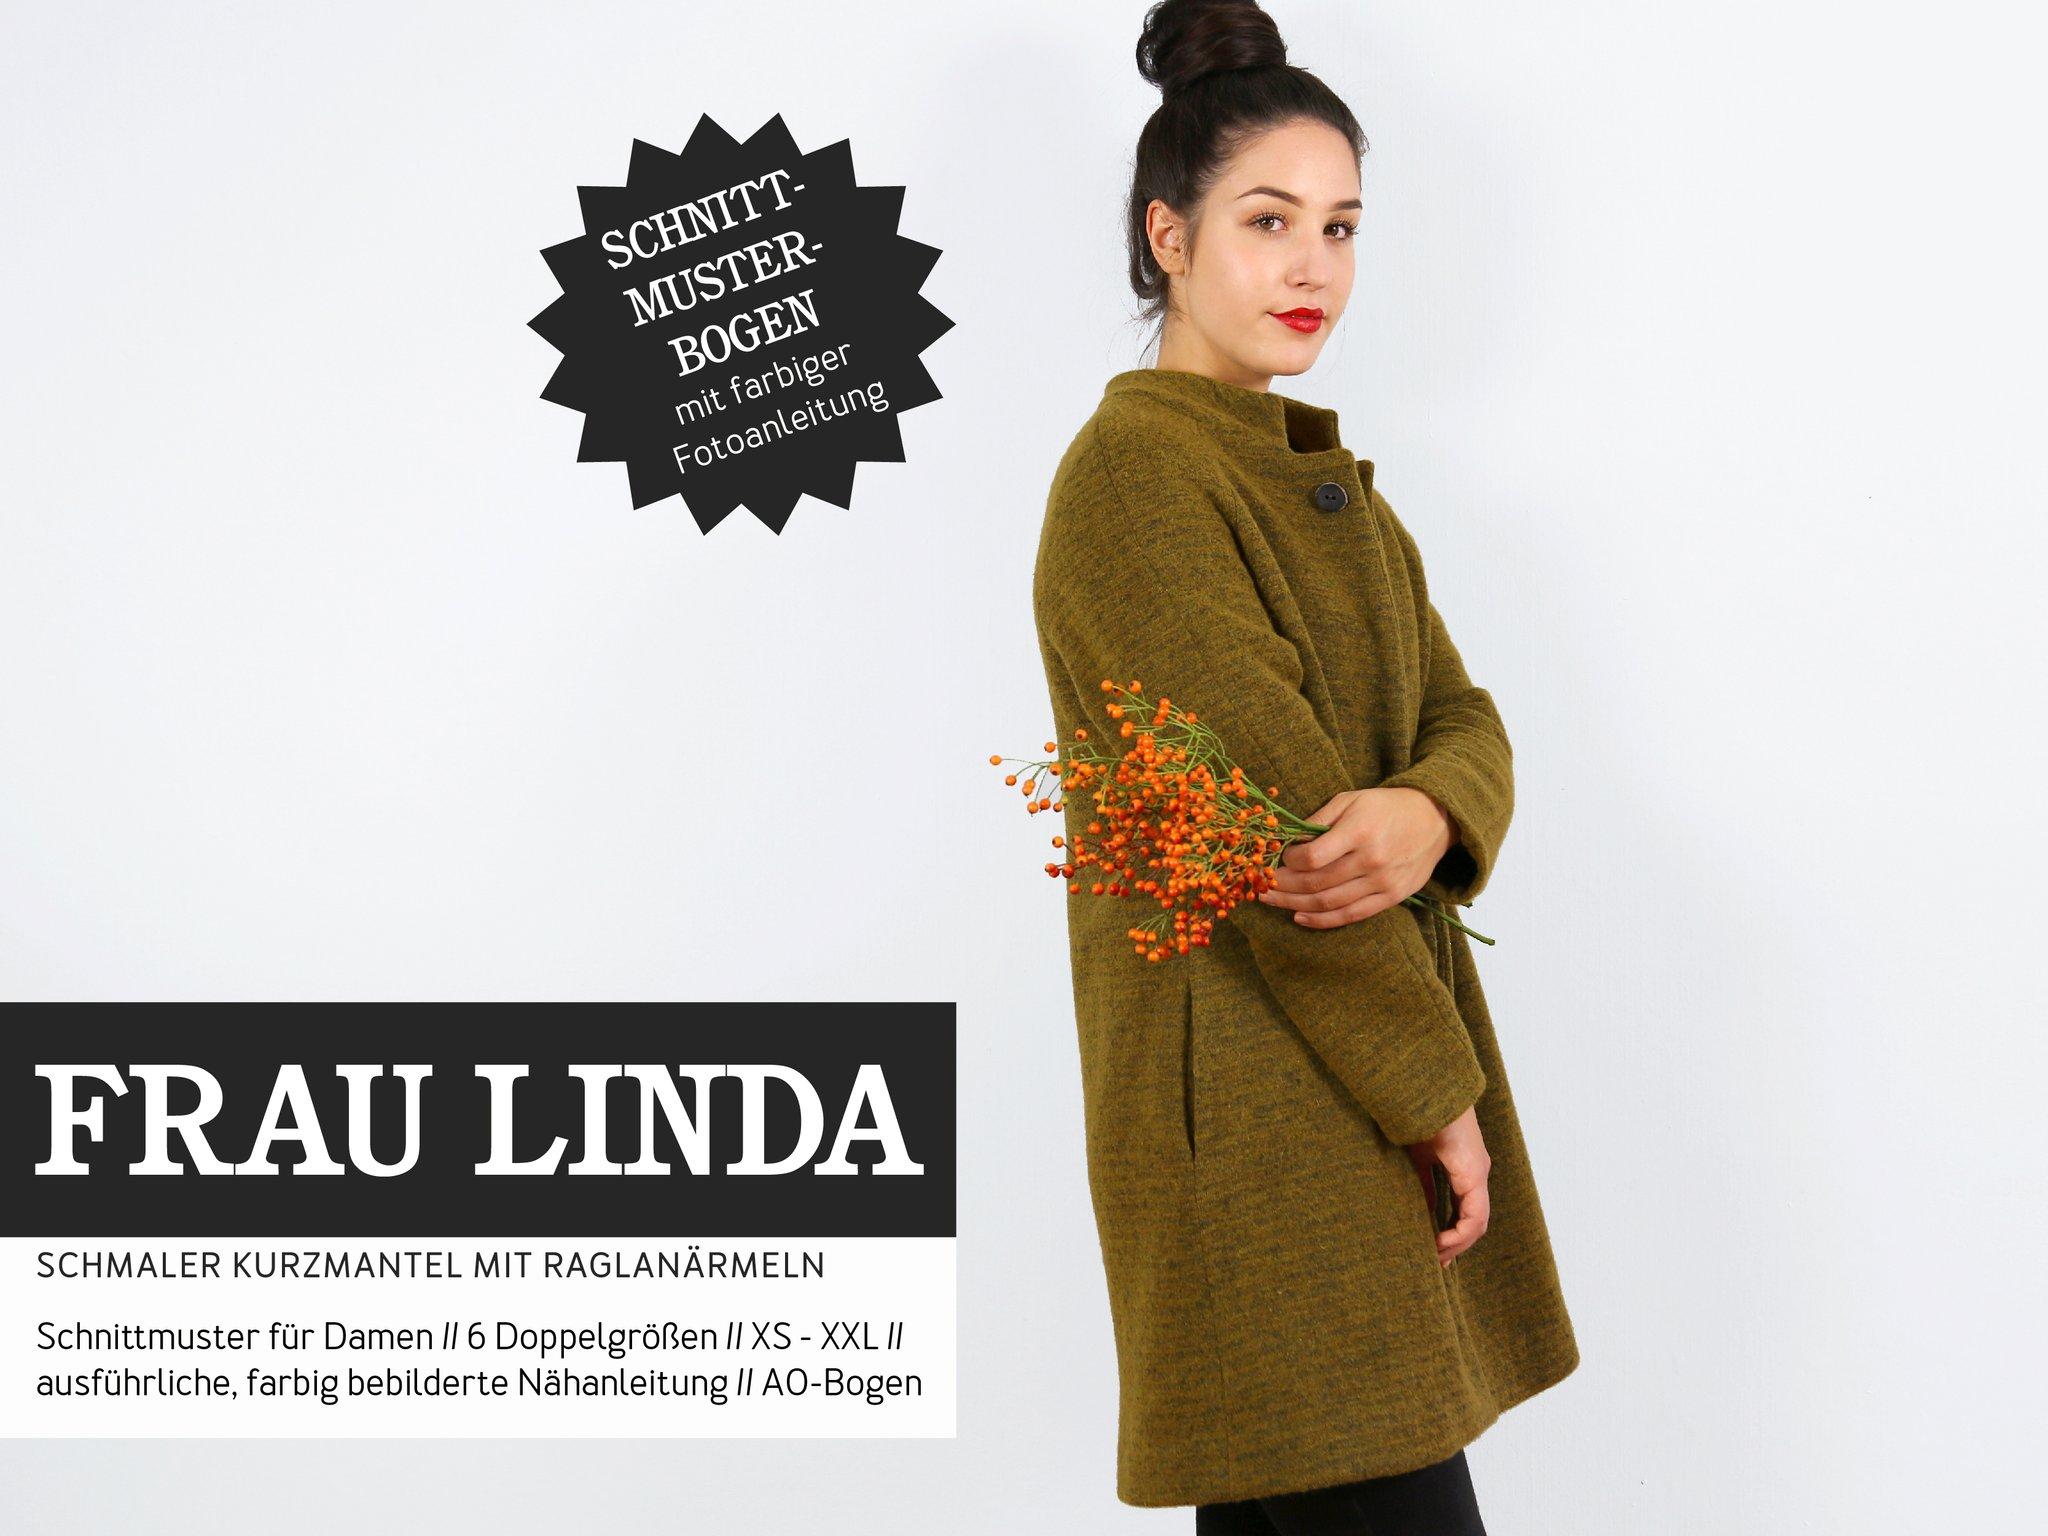 STUDIO SCHNITTREIF Frau Linda Kurzmantel - Papierschnittmuster